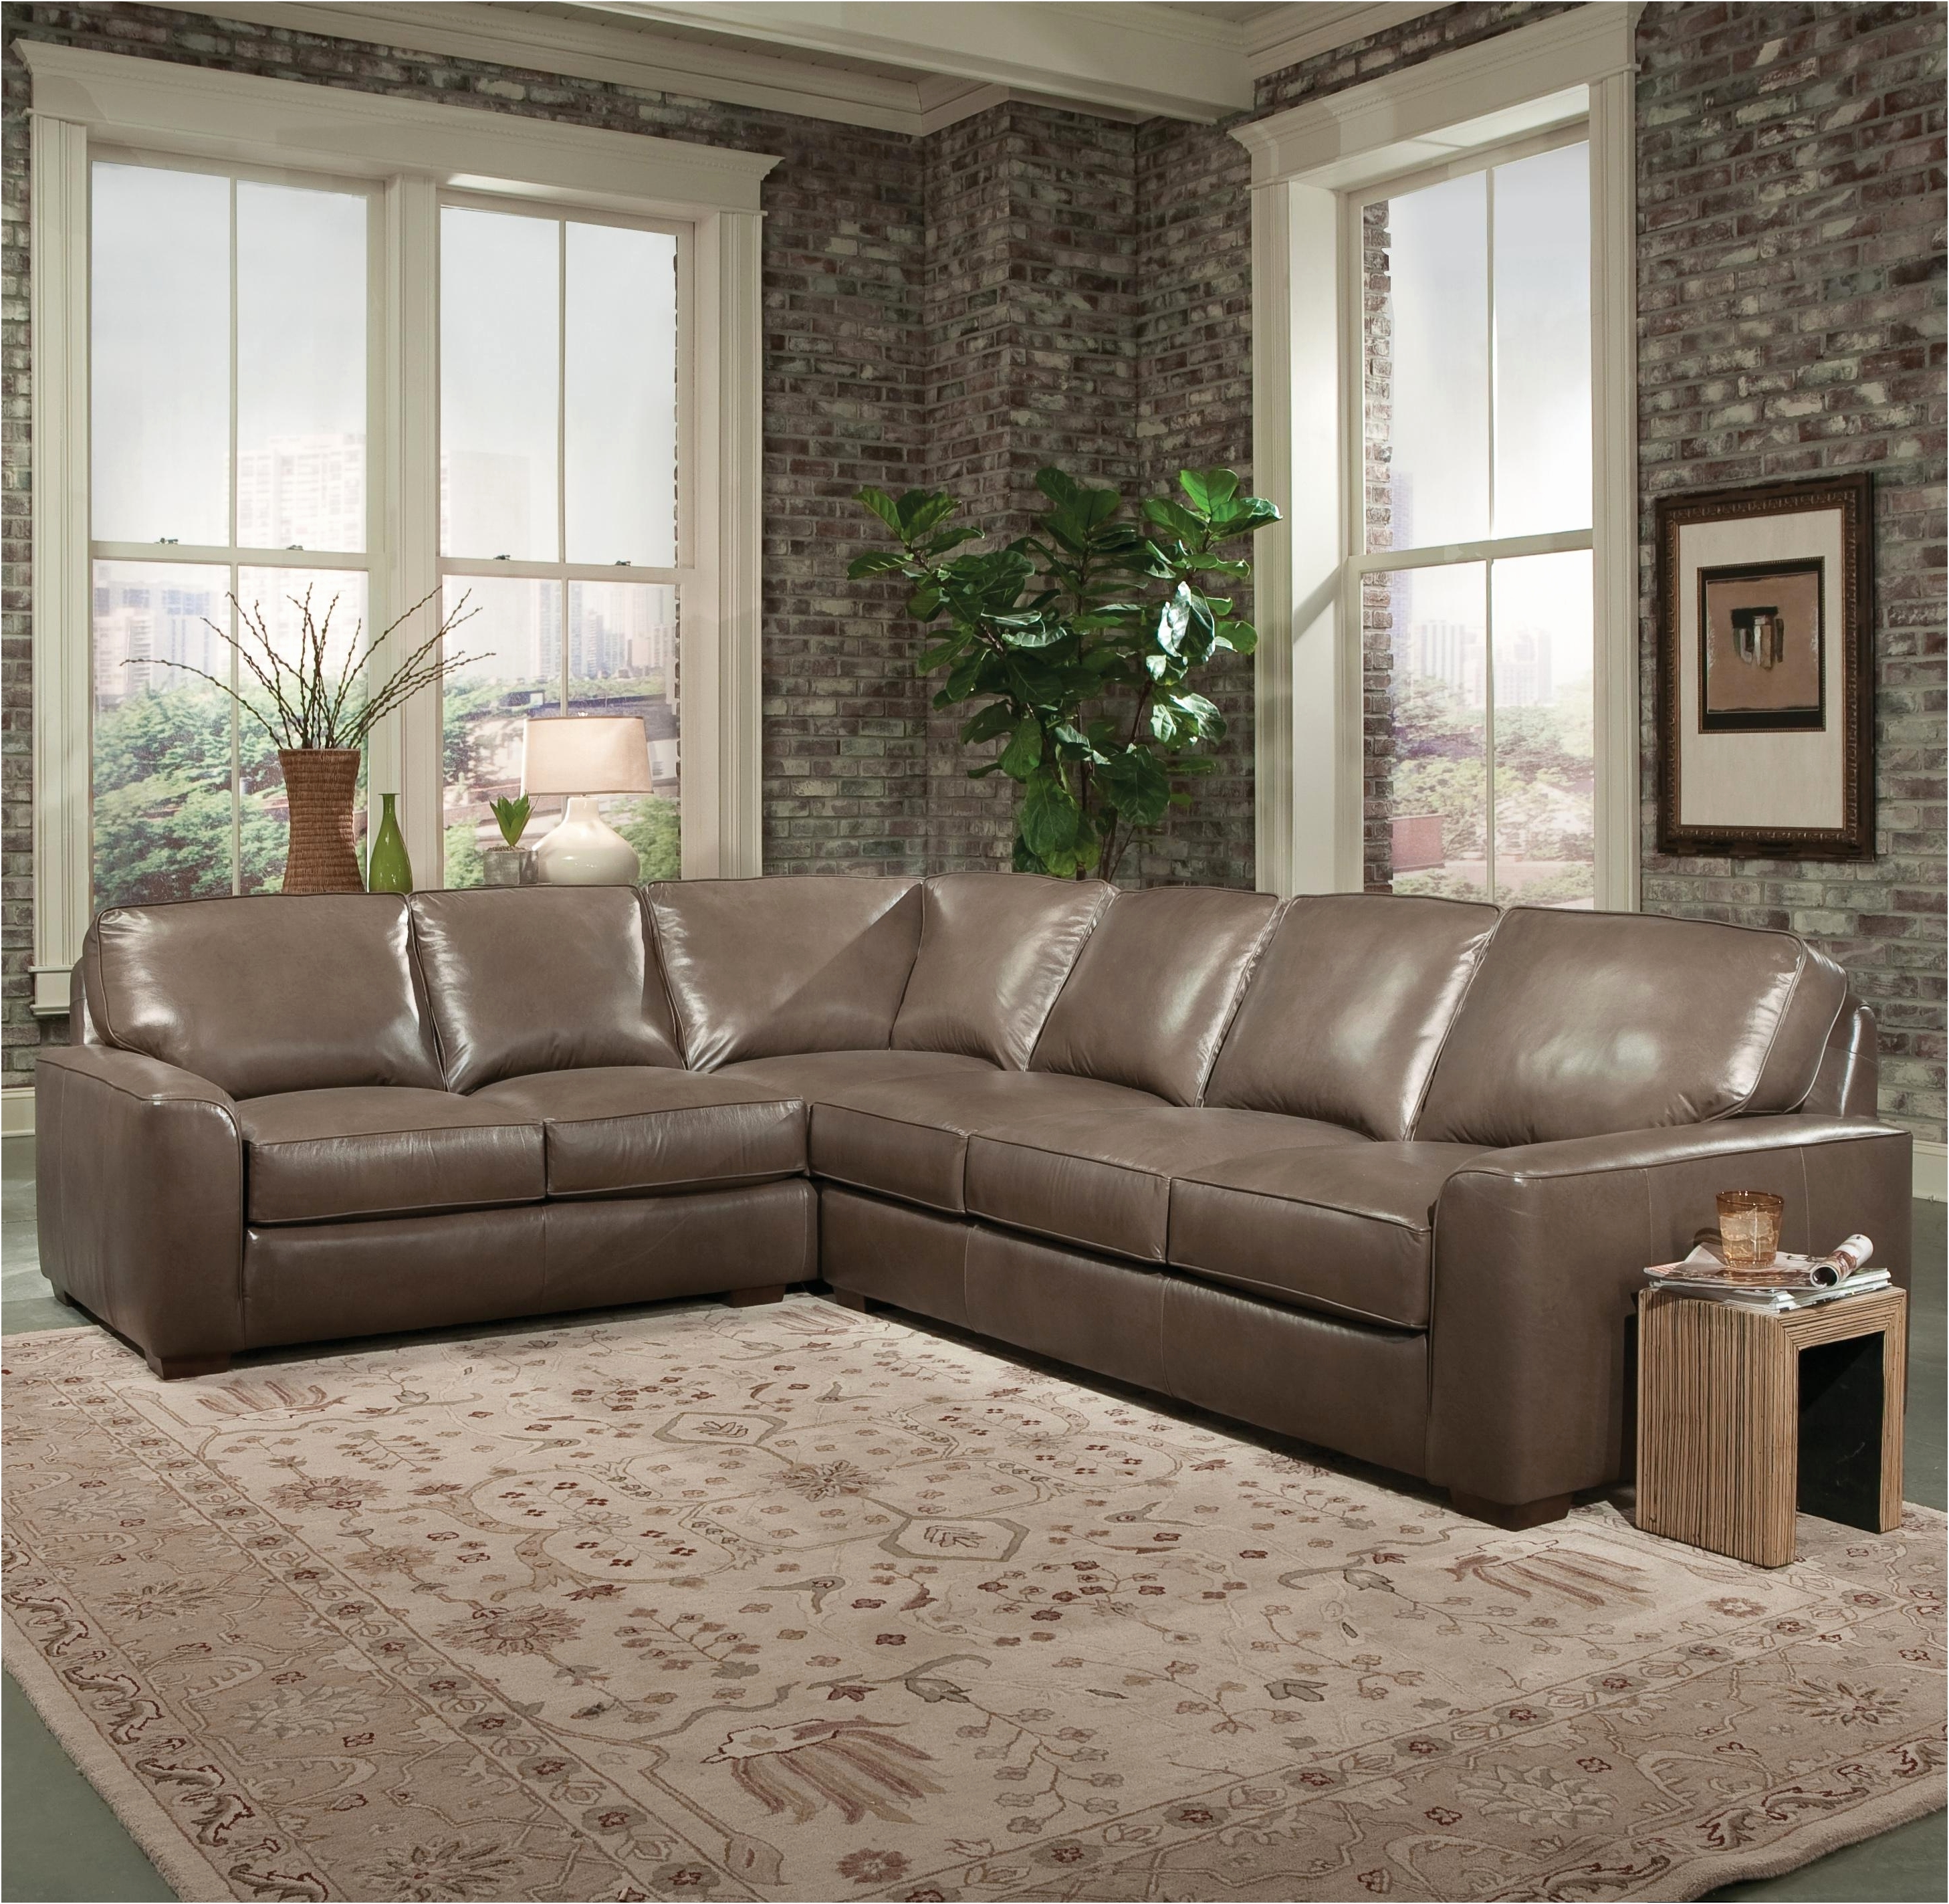 Corner Sectional Sofa Best Of Large Corner Sectional Sofasmith With Gardiners Sectional Sofas (View 10 of 10)